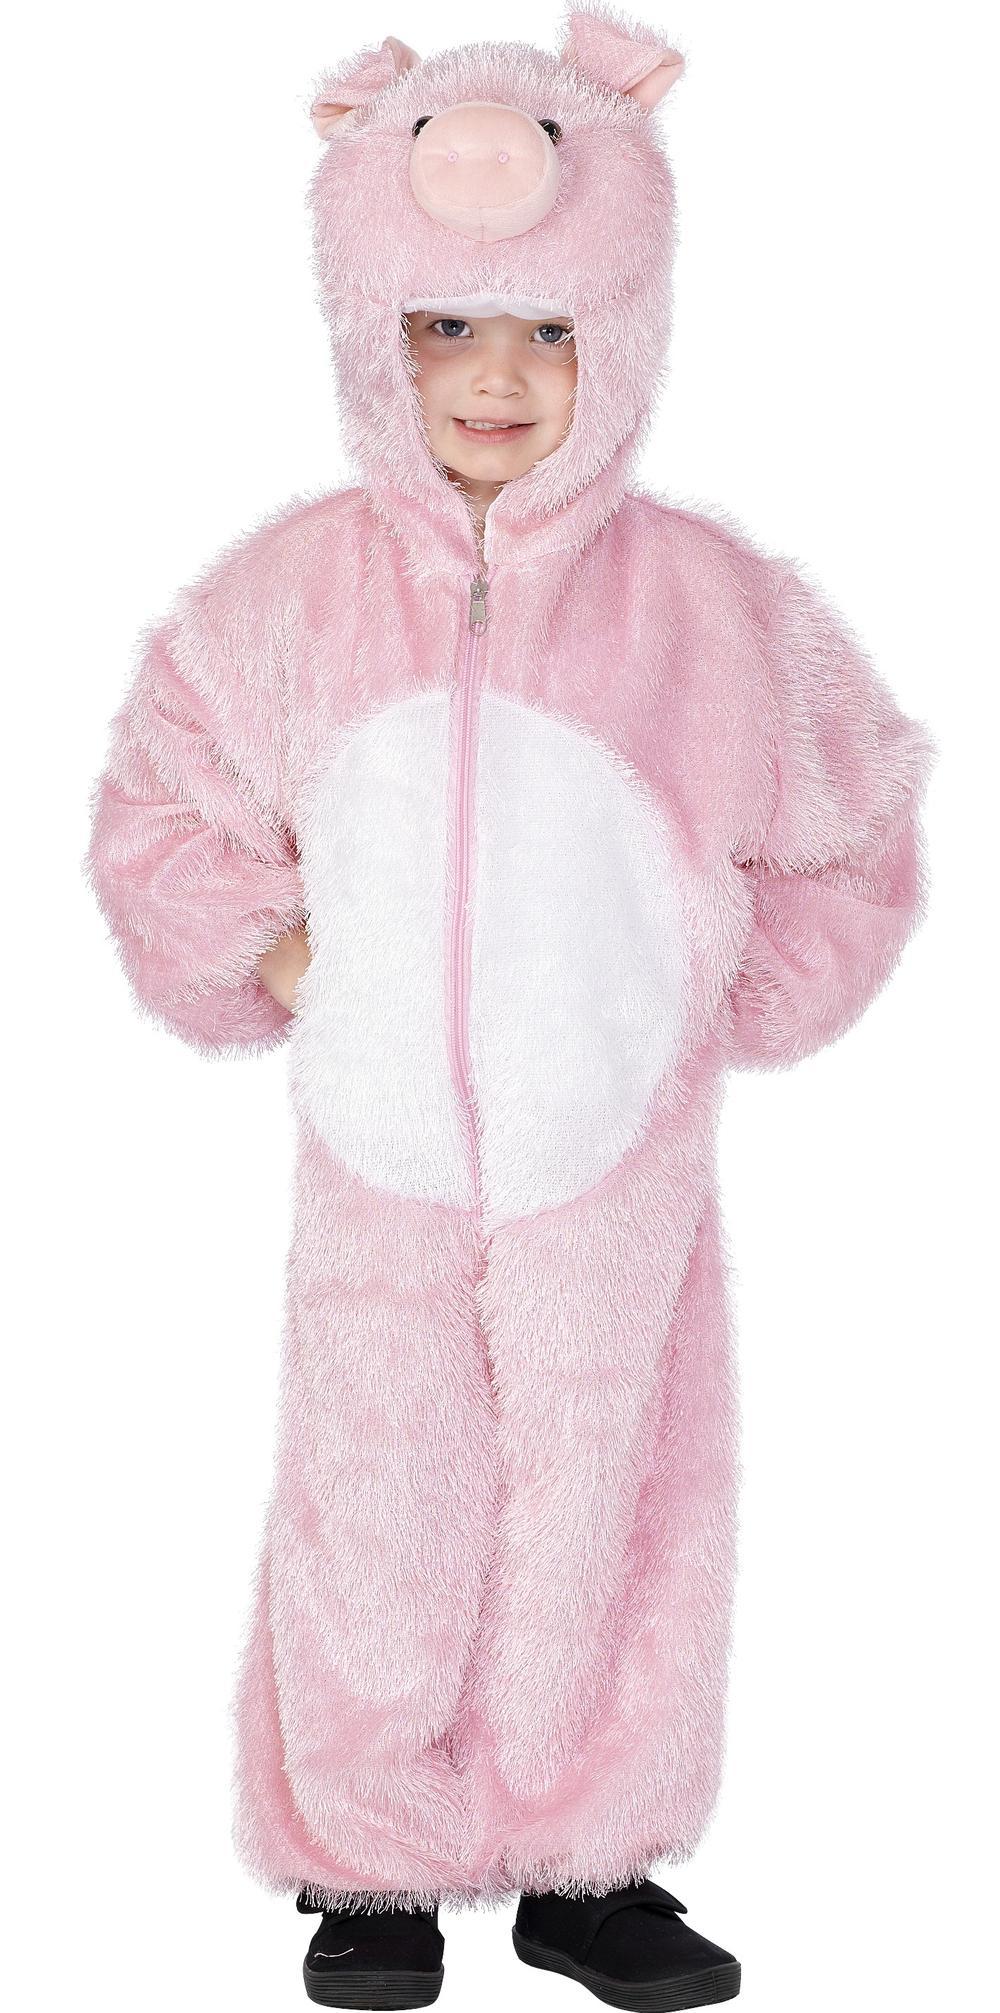 Pig Kids Fancy Dress Book Week Animal Farm Boys Girls Childrens Costume Outfit